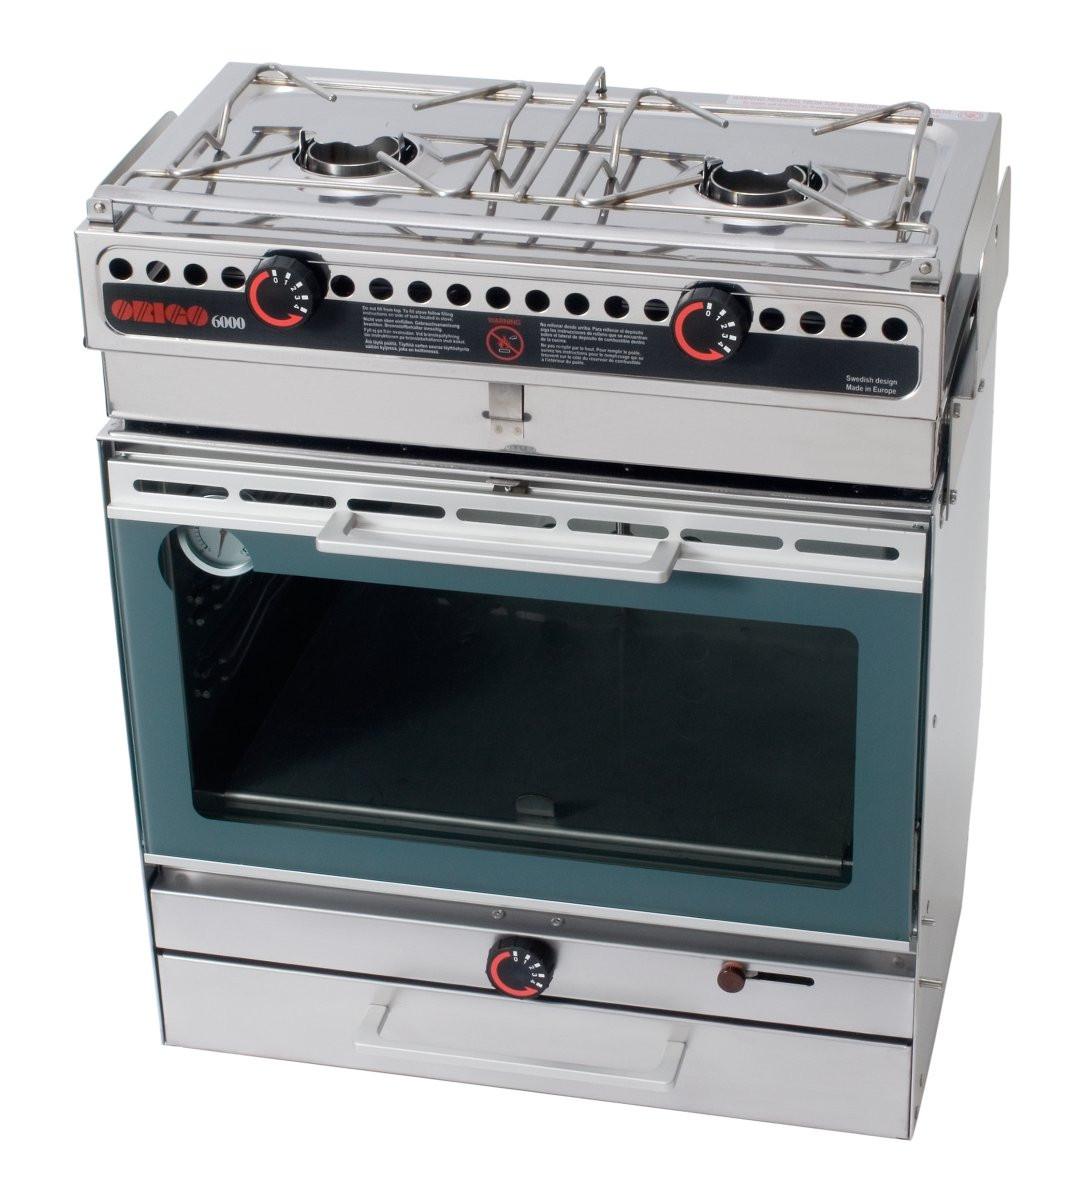 Dometic Origo 6000 Meths Marine Oven Stove